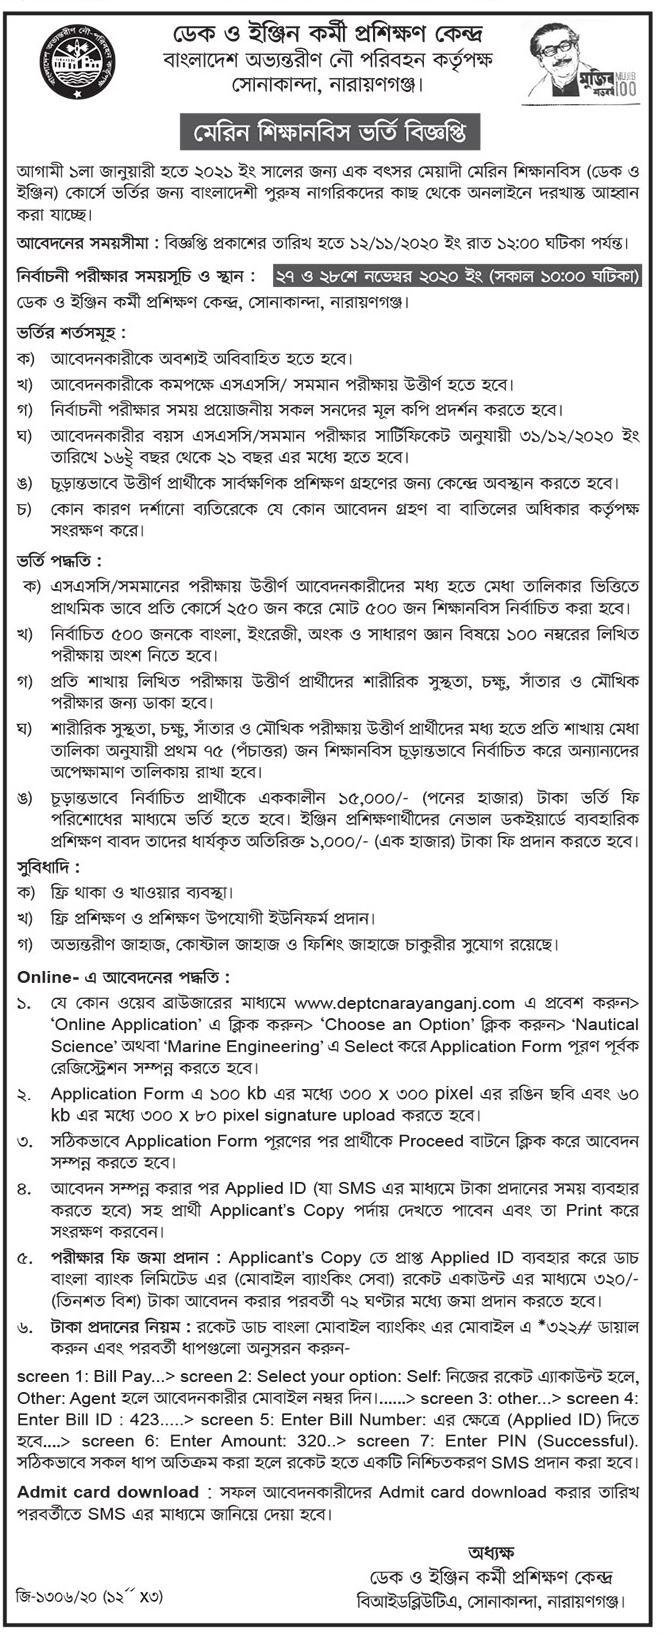 Narayanganj Marine Probationary Admission Circular 2020